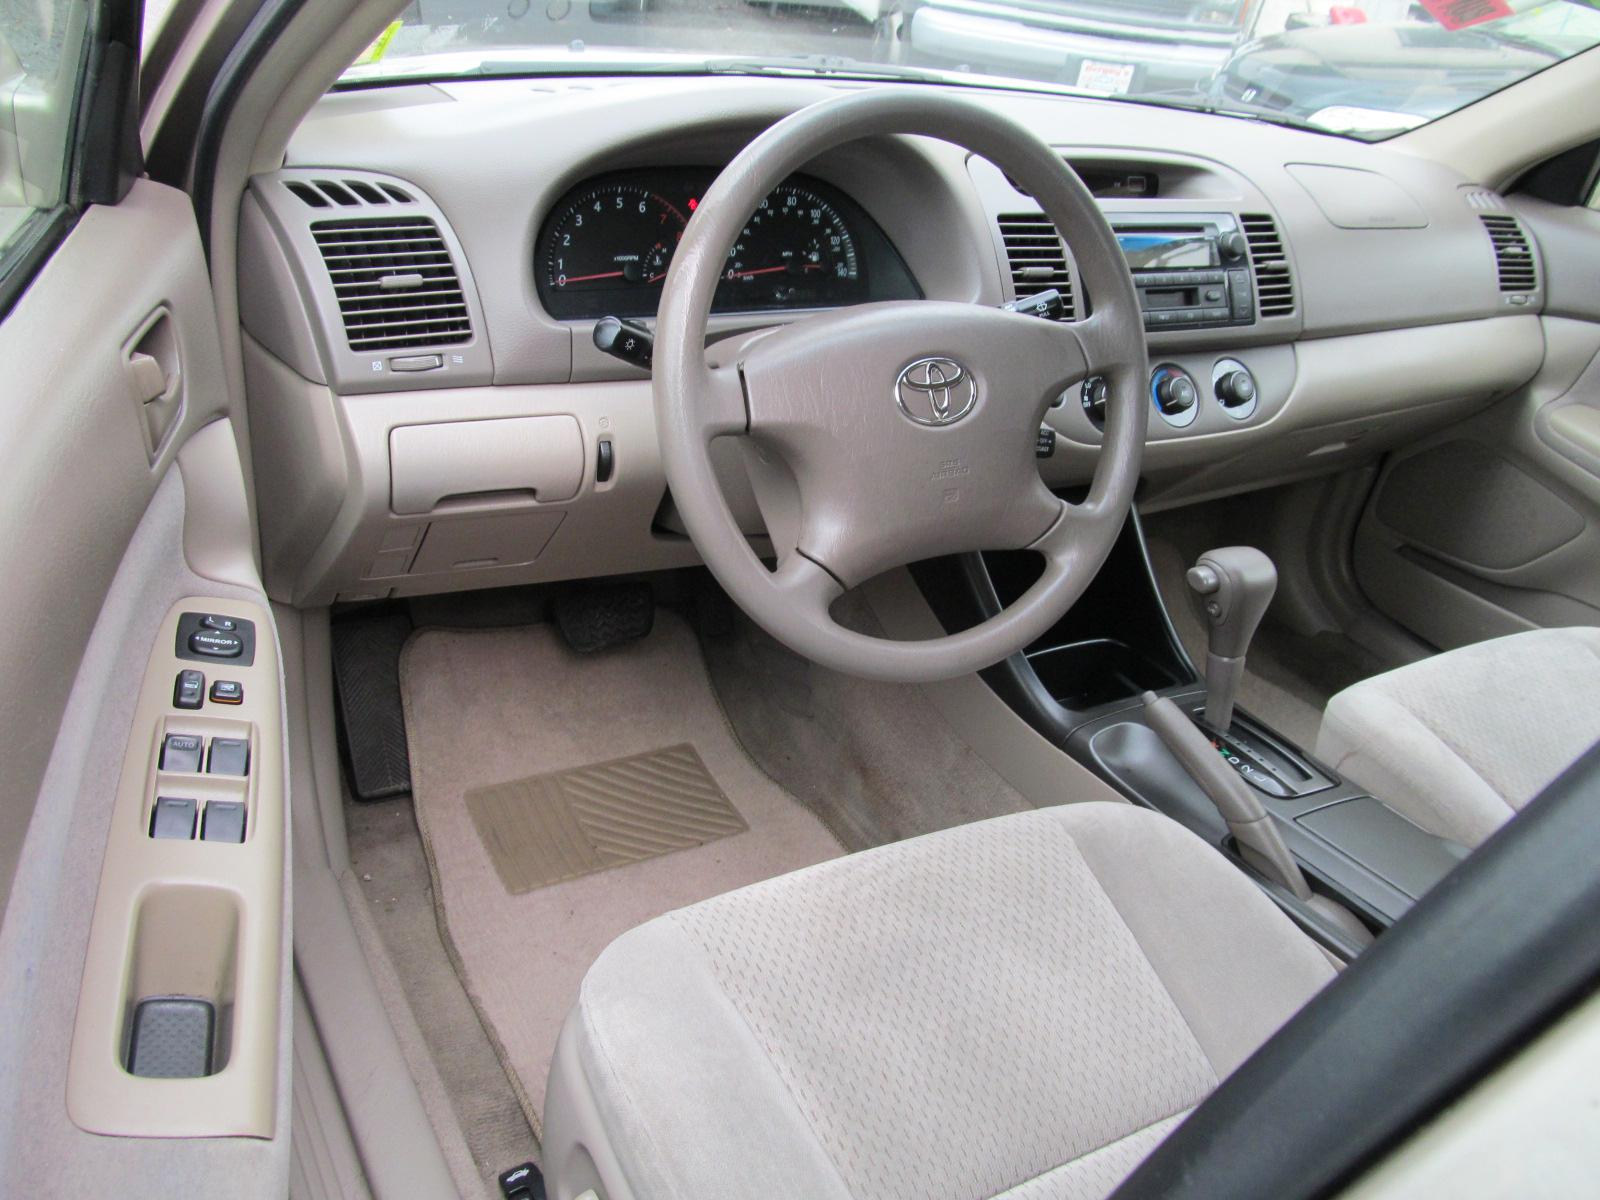 2004 Toyota Camry Pictures Cargurus